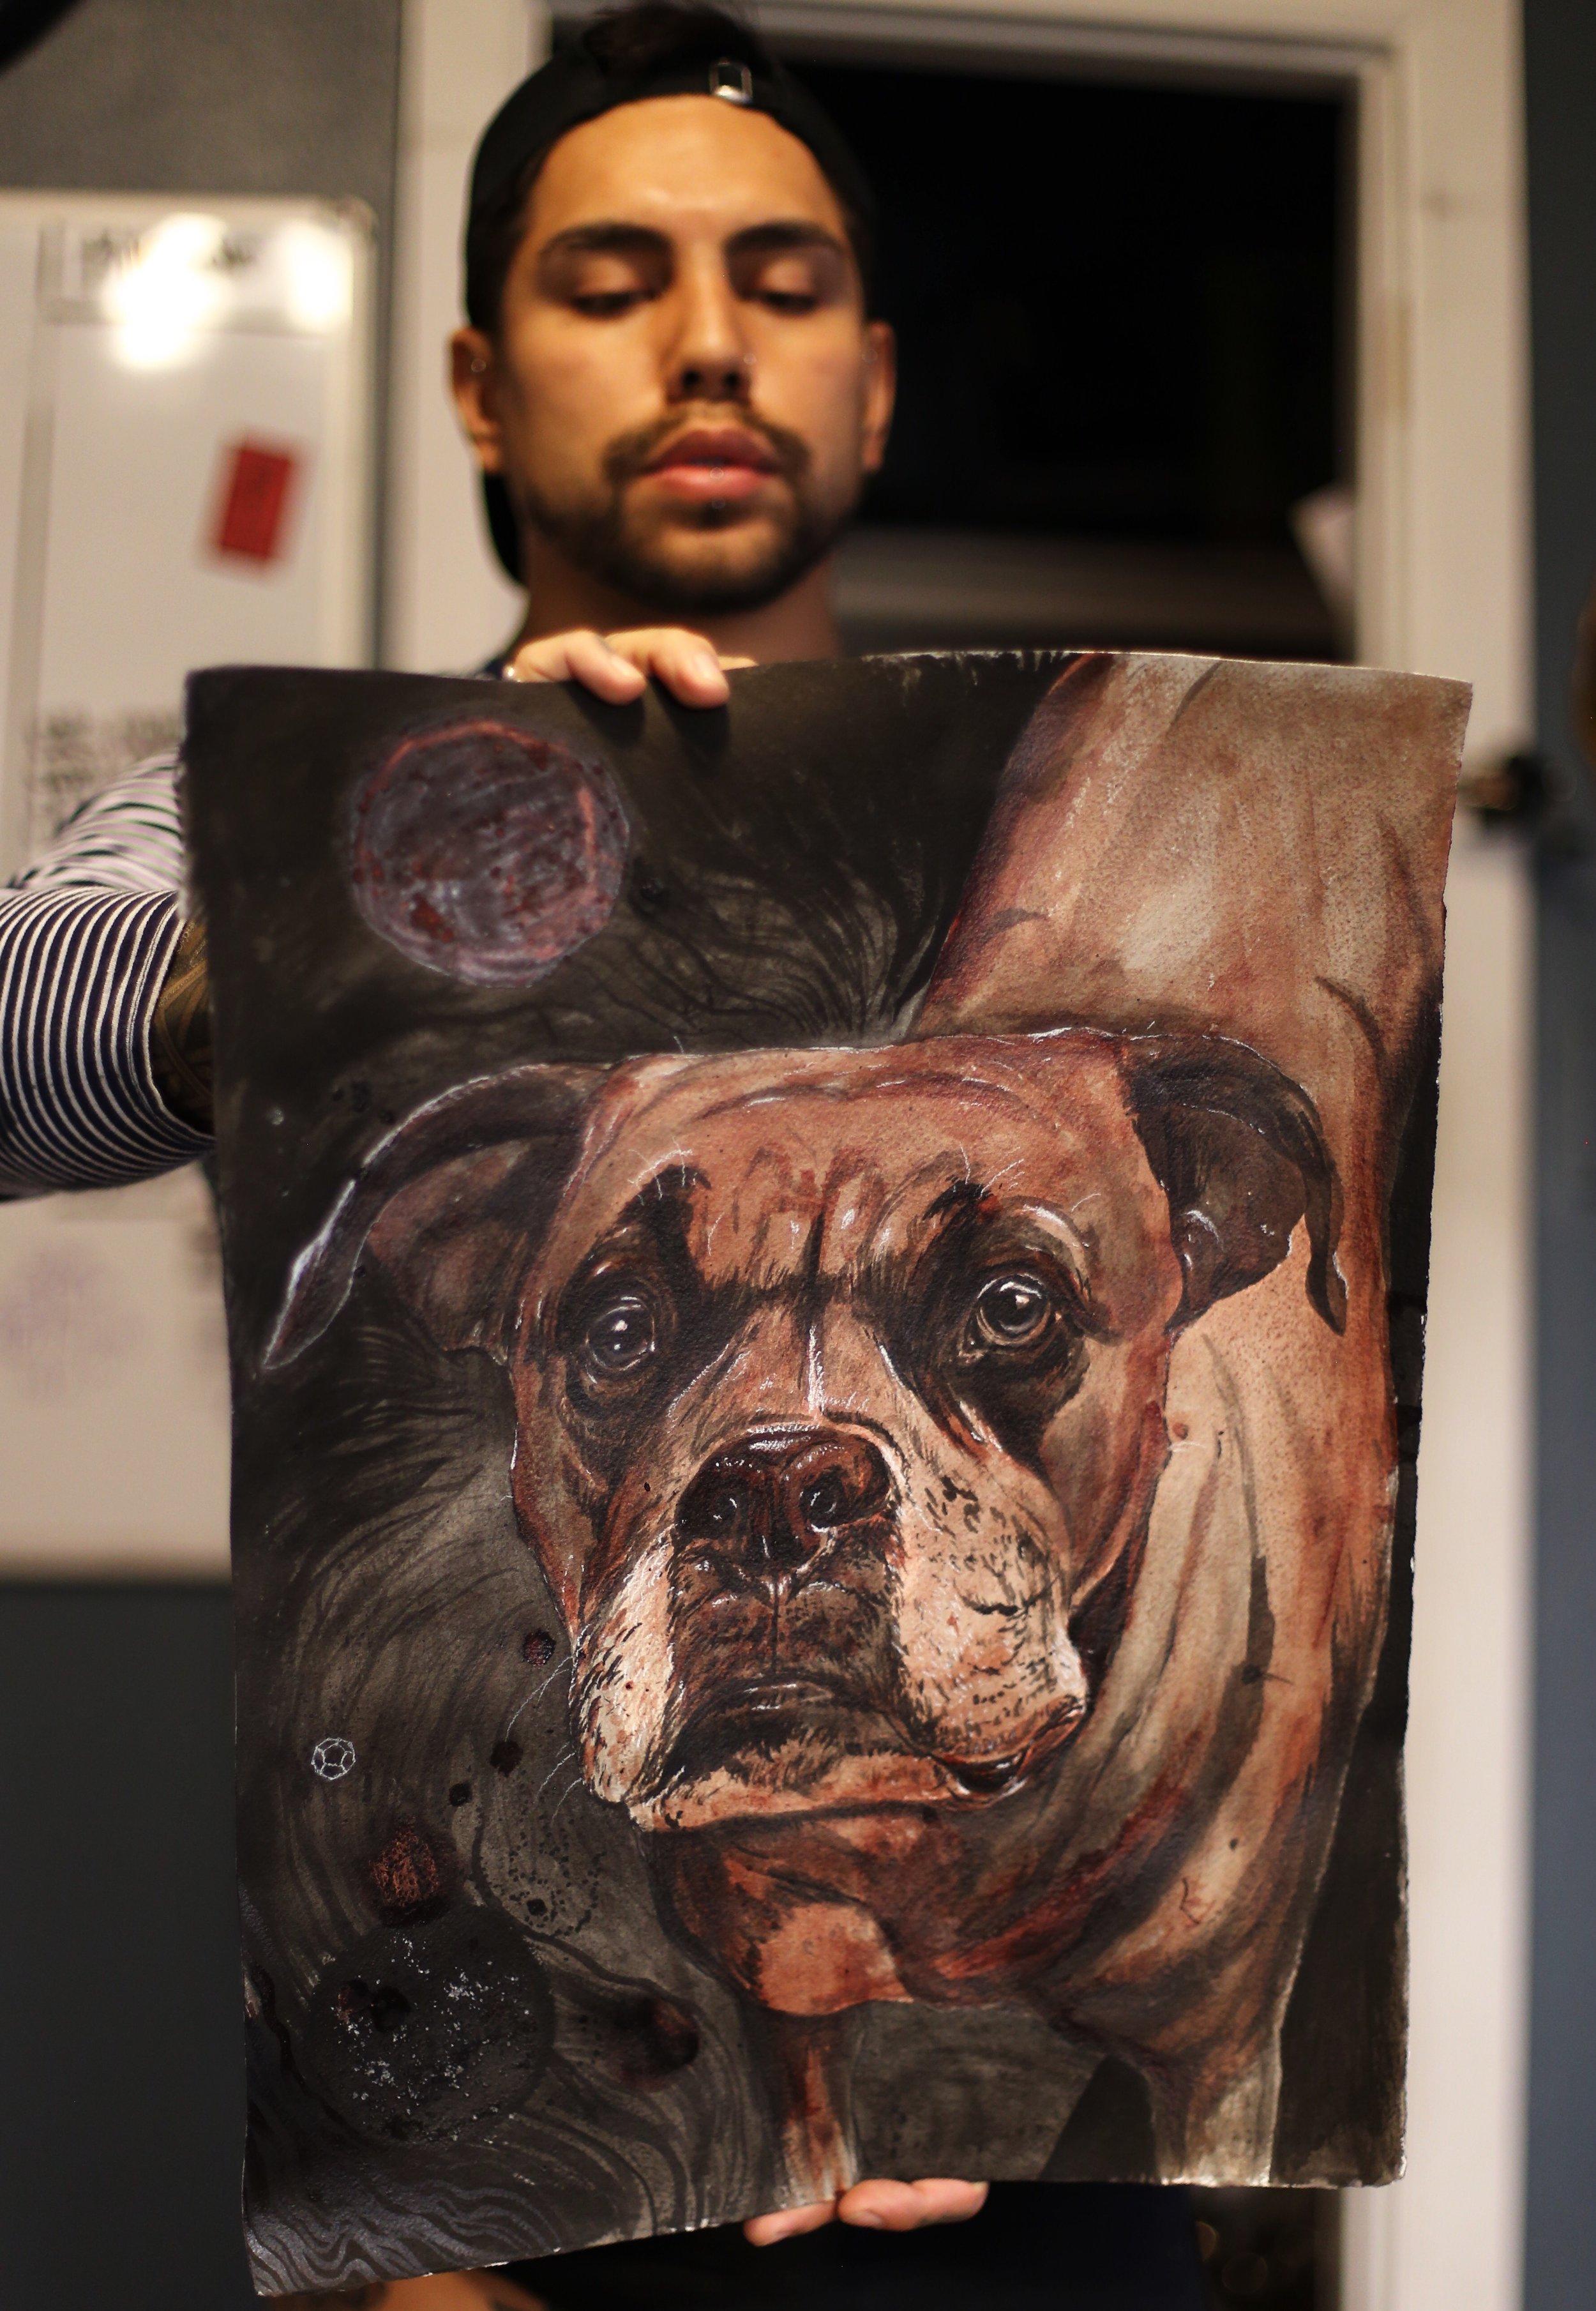 enrique bernal ejay tattoo dallas texas Caleb sena and Marie barnard painting.jpeg